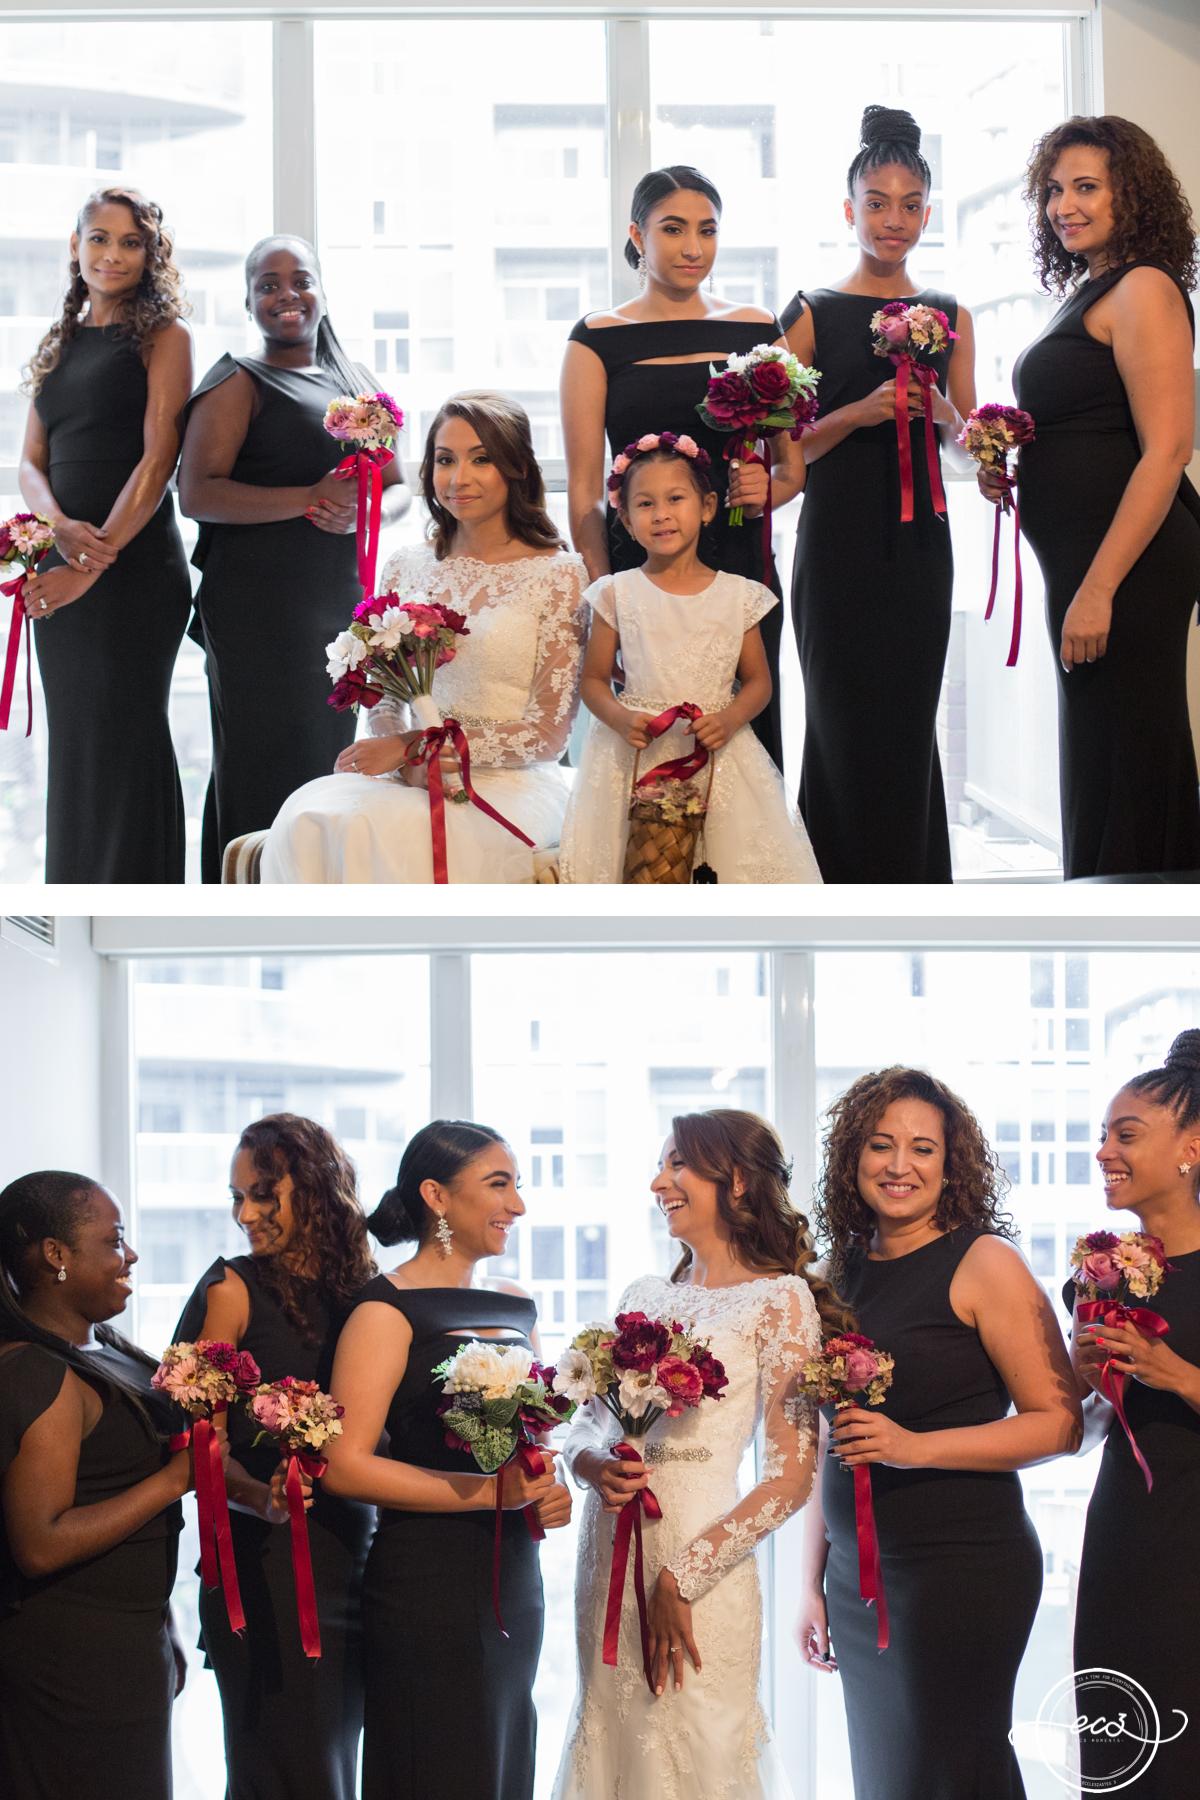 AA-Rustic-Toronto-Burroughes-Wedding17.jpg